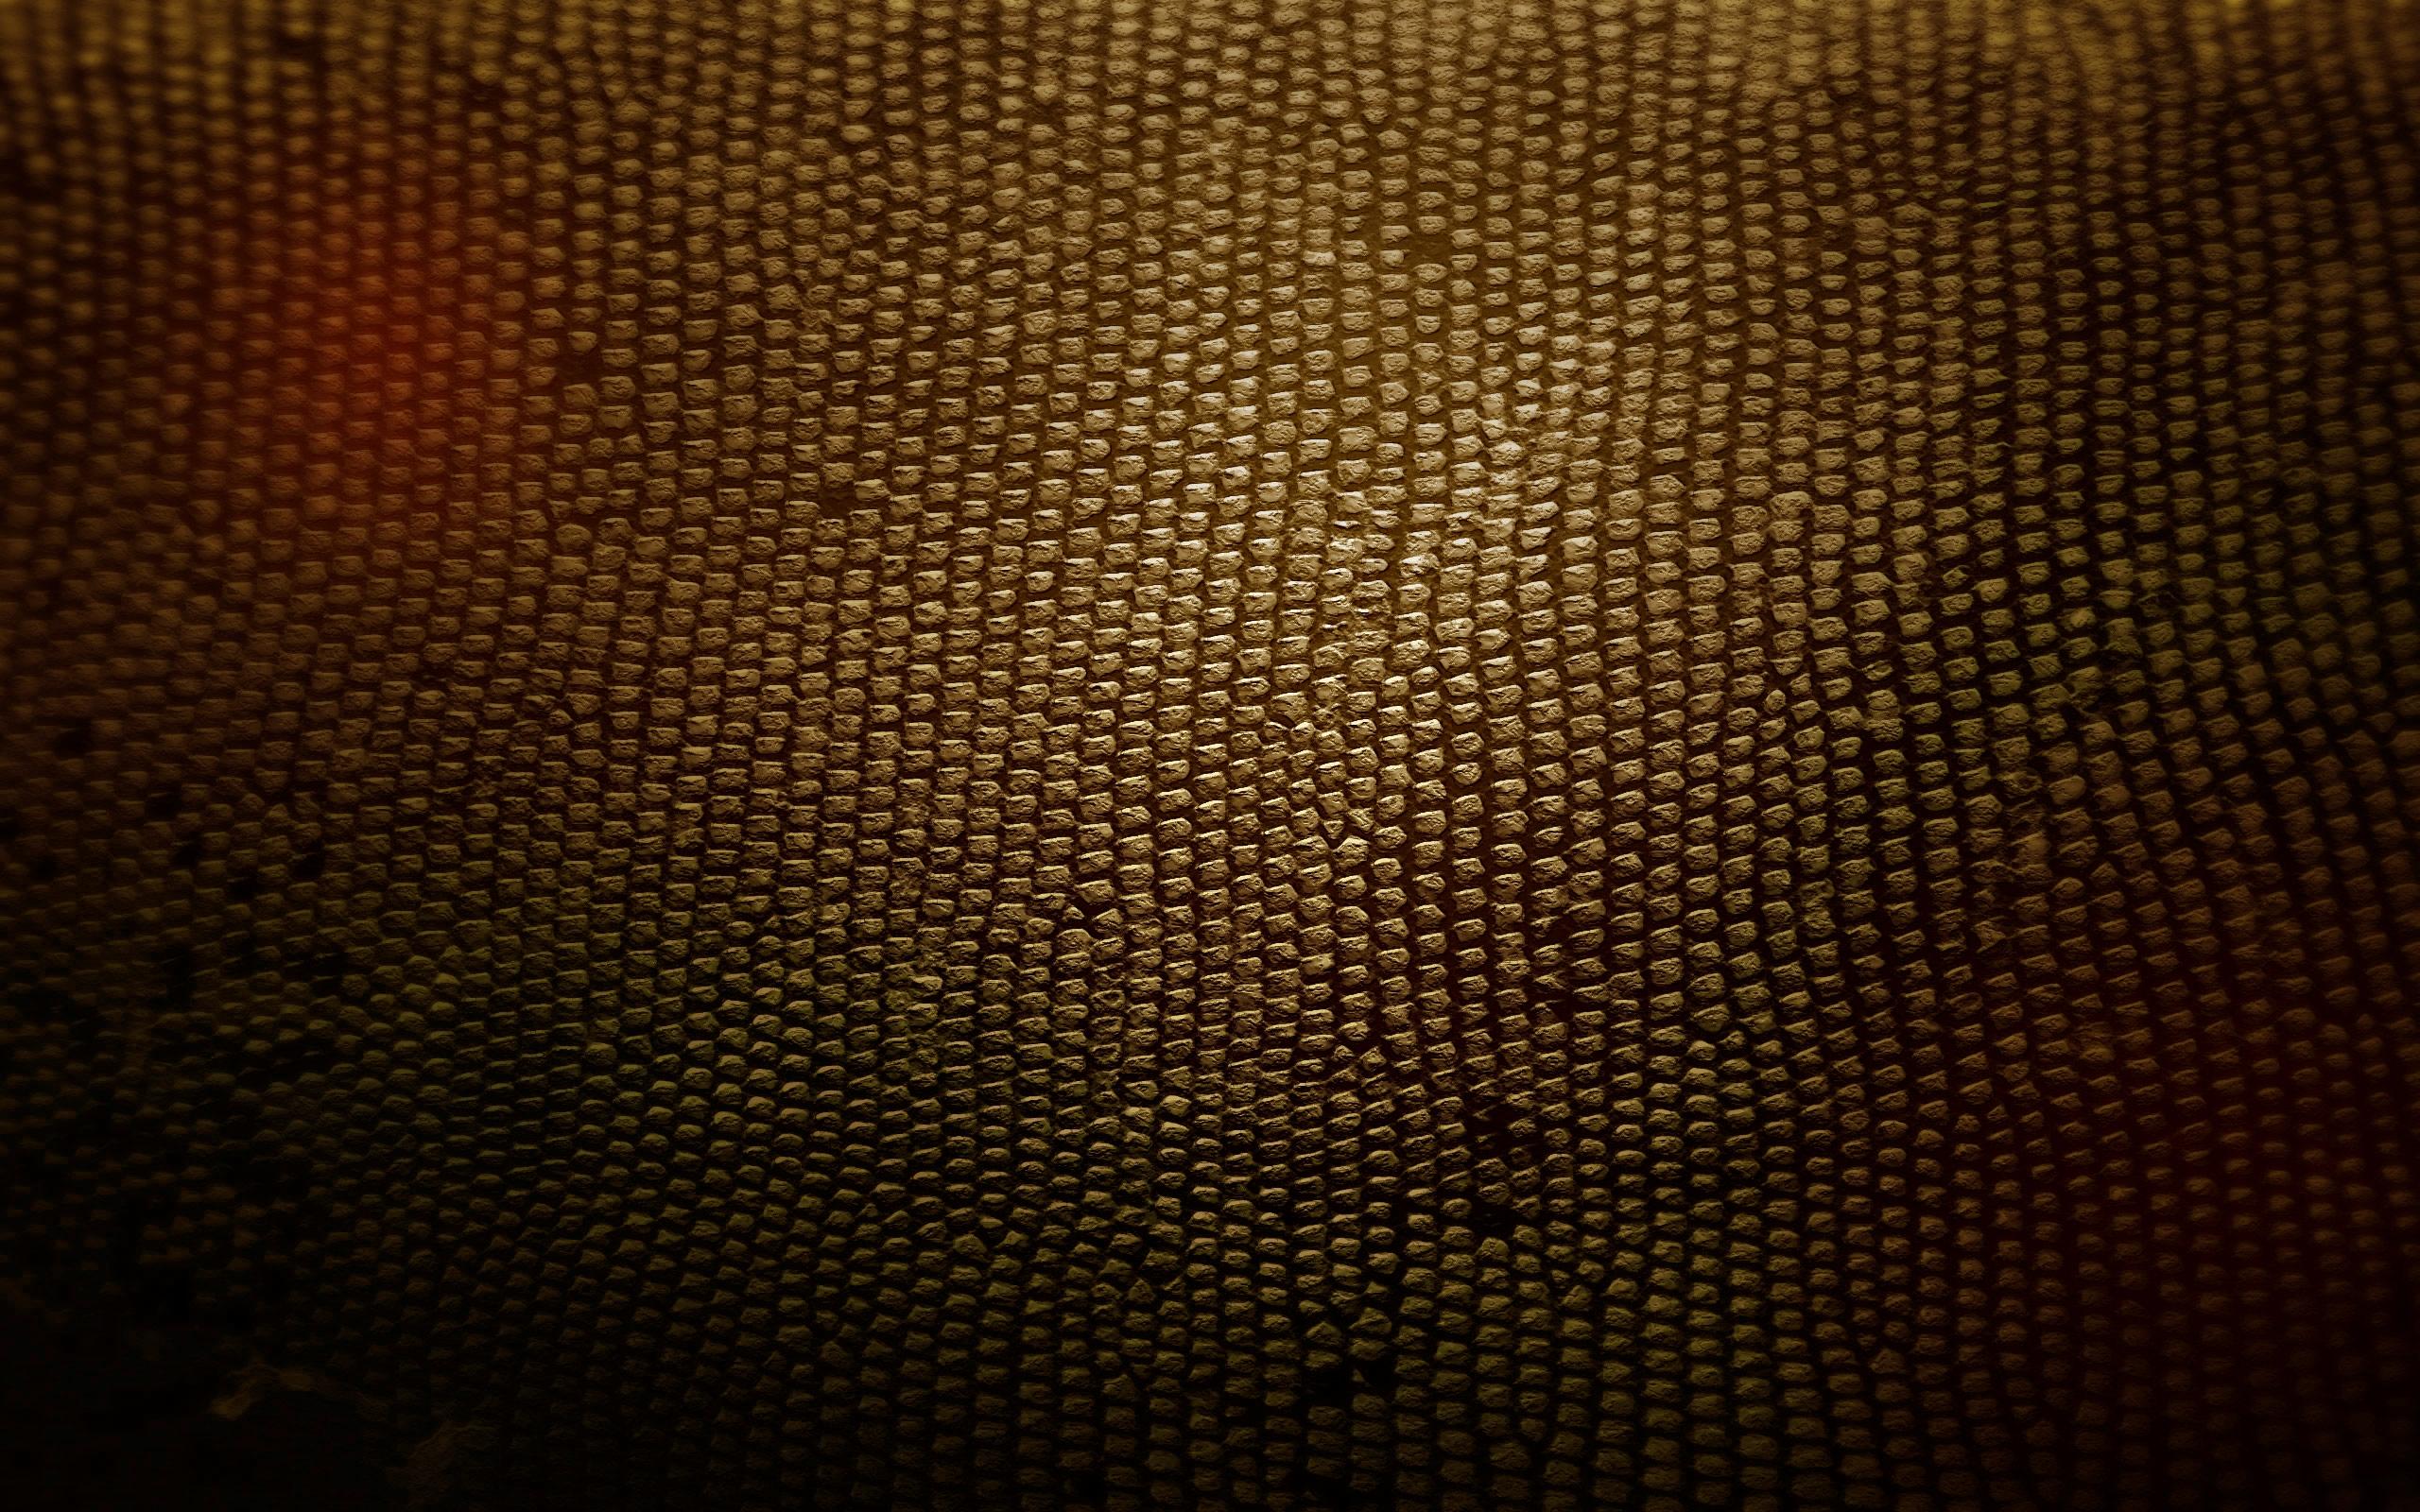 Unduh 900+ Wallpaper Hitam Coklat  Paling Baru